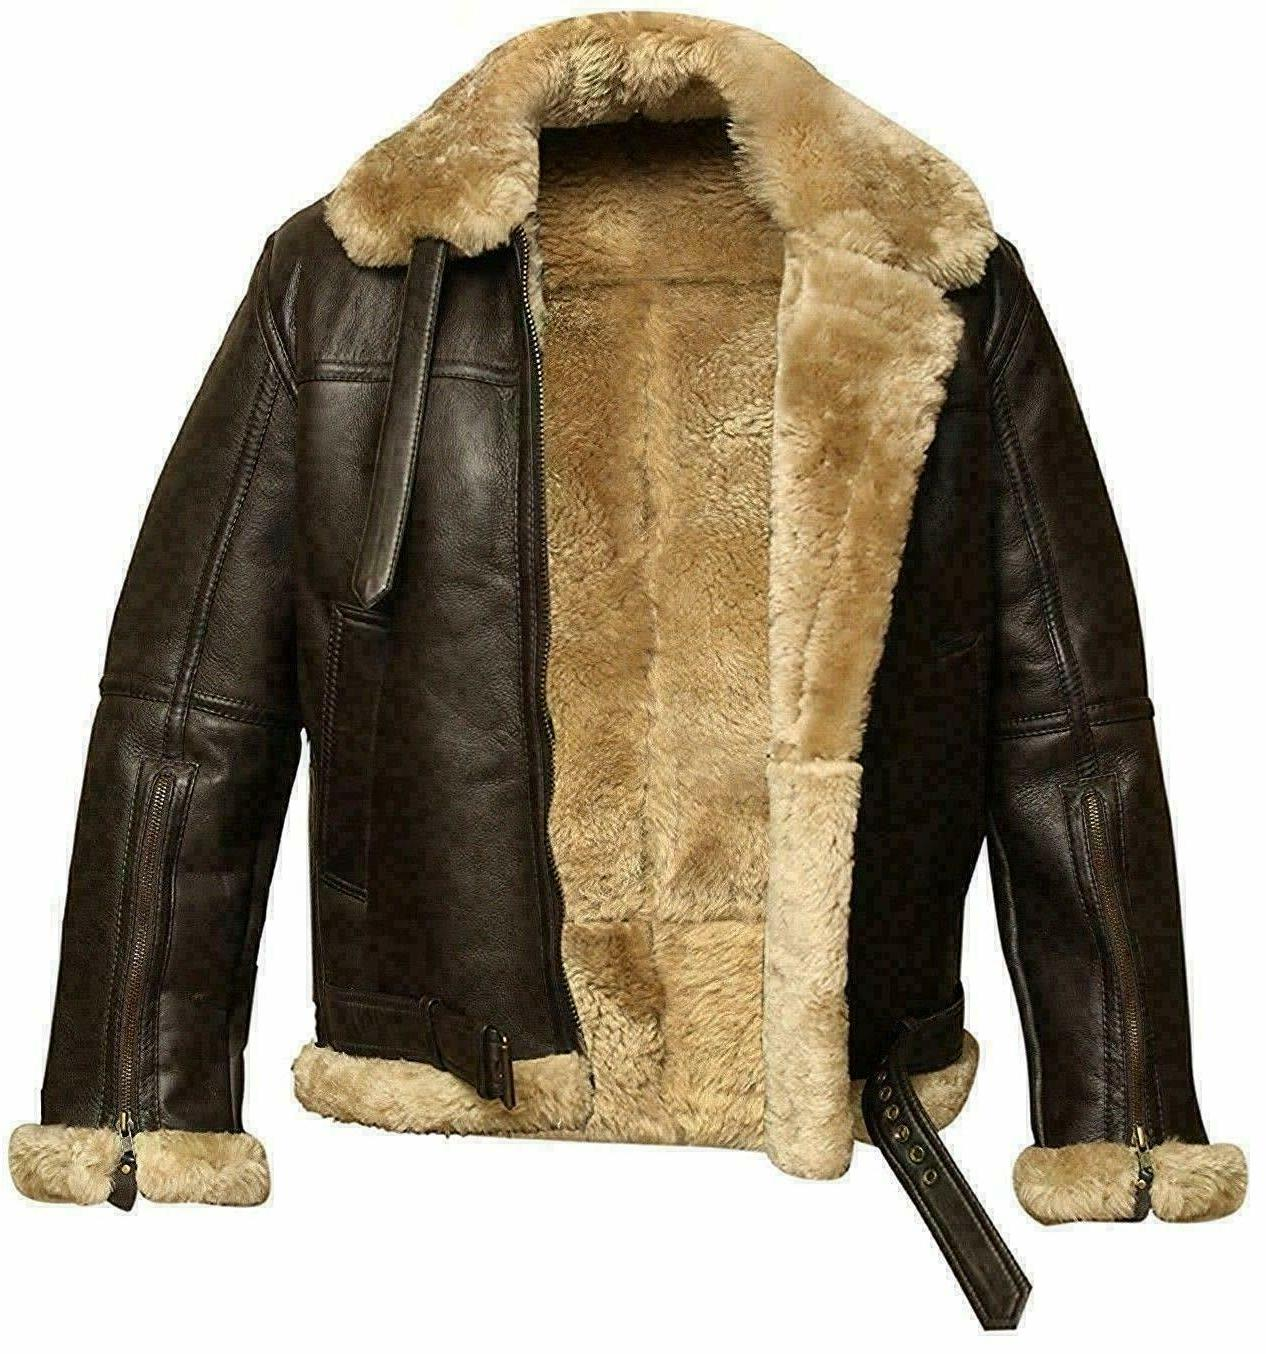 Men's RAF Aviator Real Leather Jacket Coat Bomber B3 Sheep S